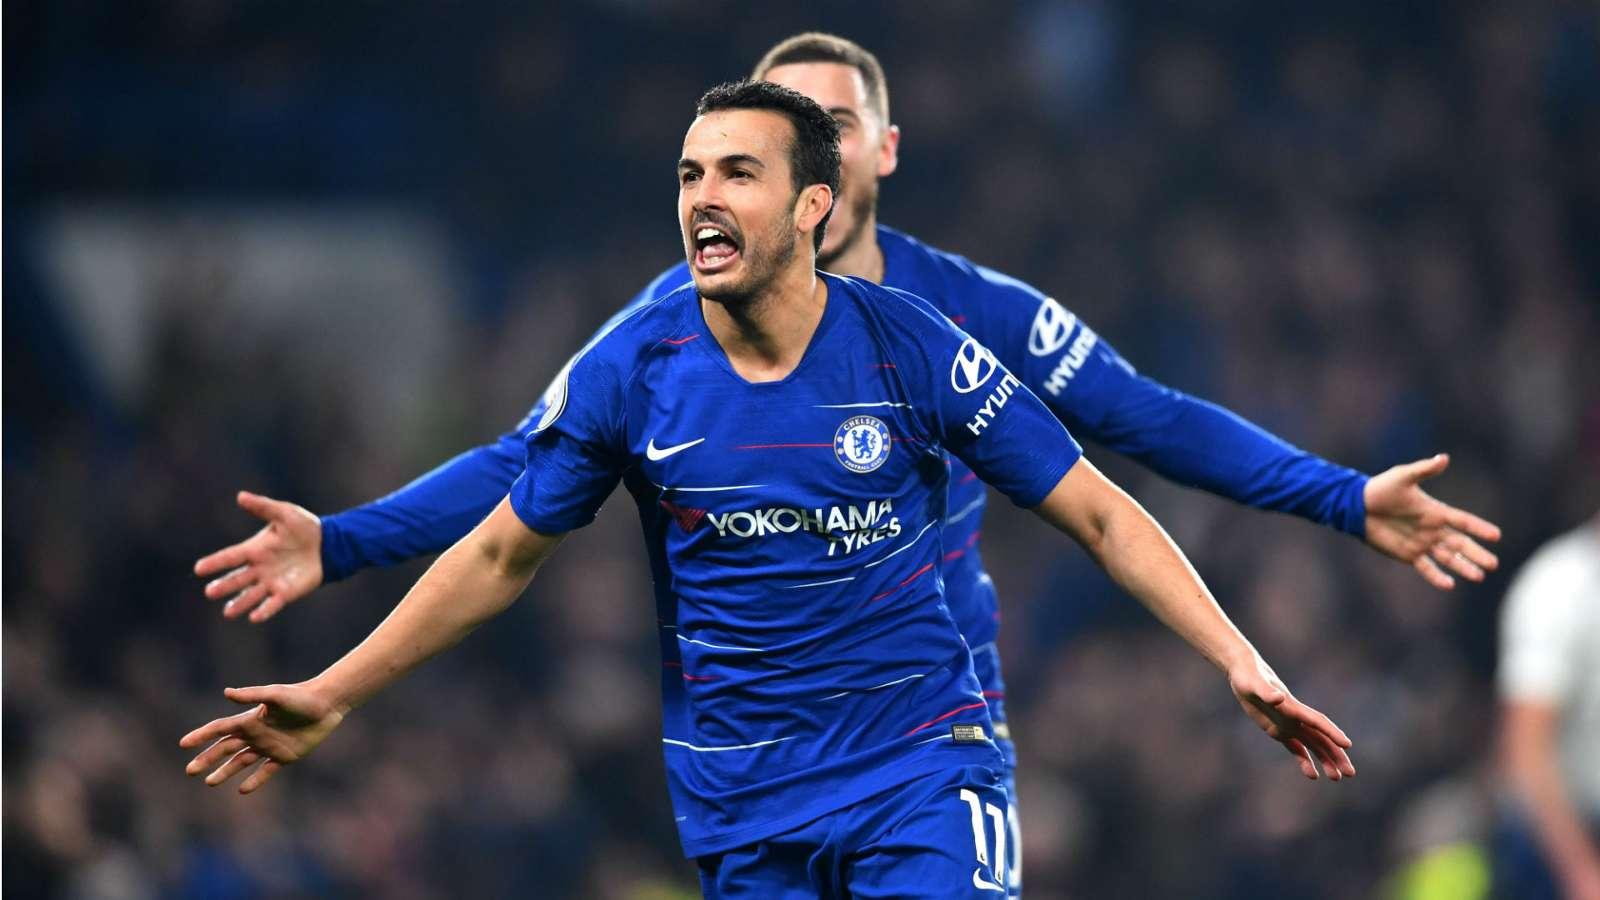 pedro cropped 1szdcq0sa9slq1nzqhgr5kpq74 - Chelsea vs Tottenham 2-0: Premier League Match Report & Highlights [Watch Video]